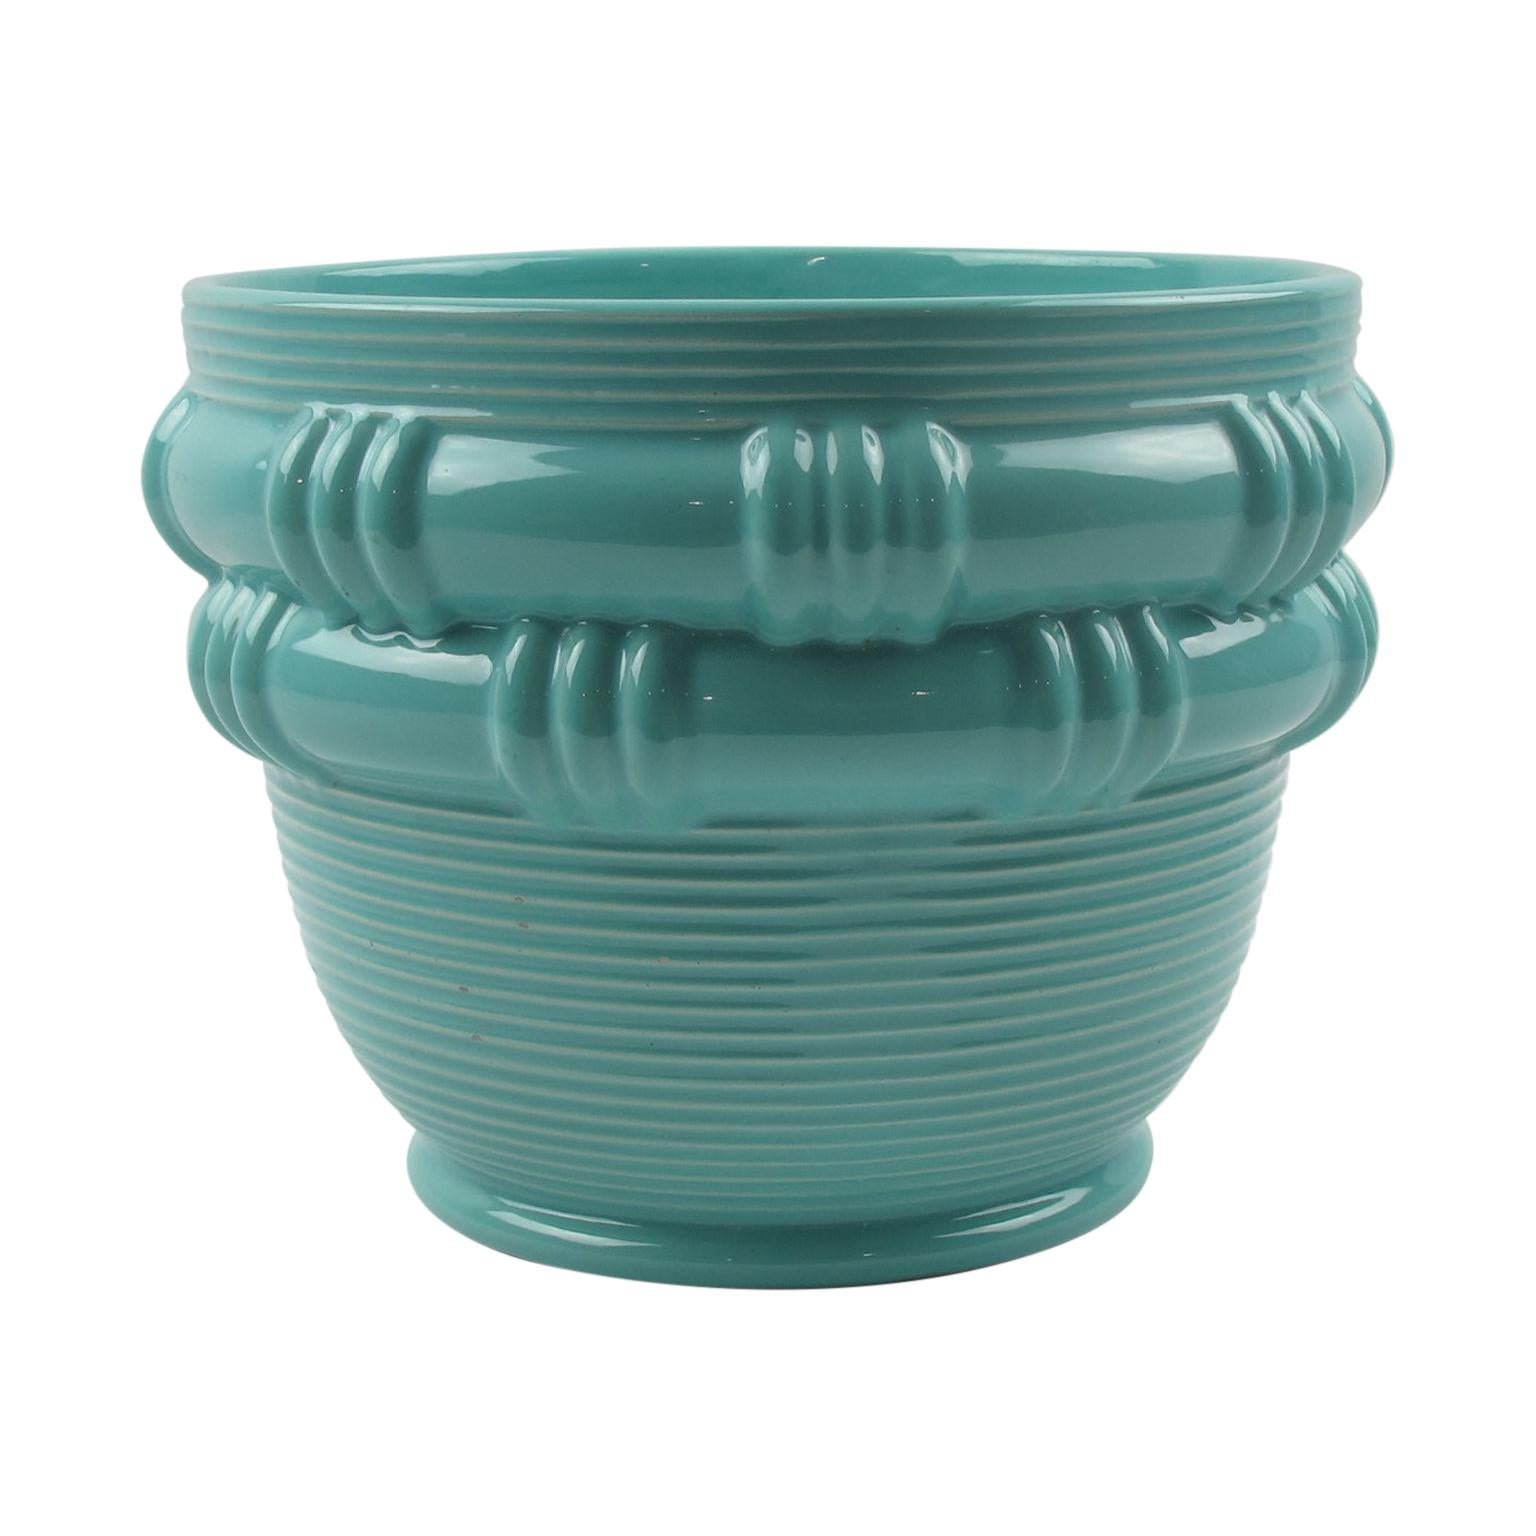 Blanche Letalle for Saint Clement Turquoise Ceramic Vase Planter